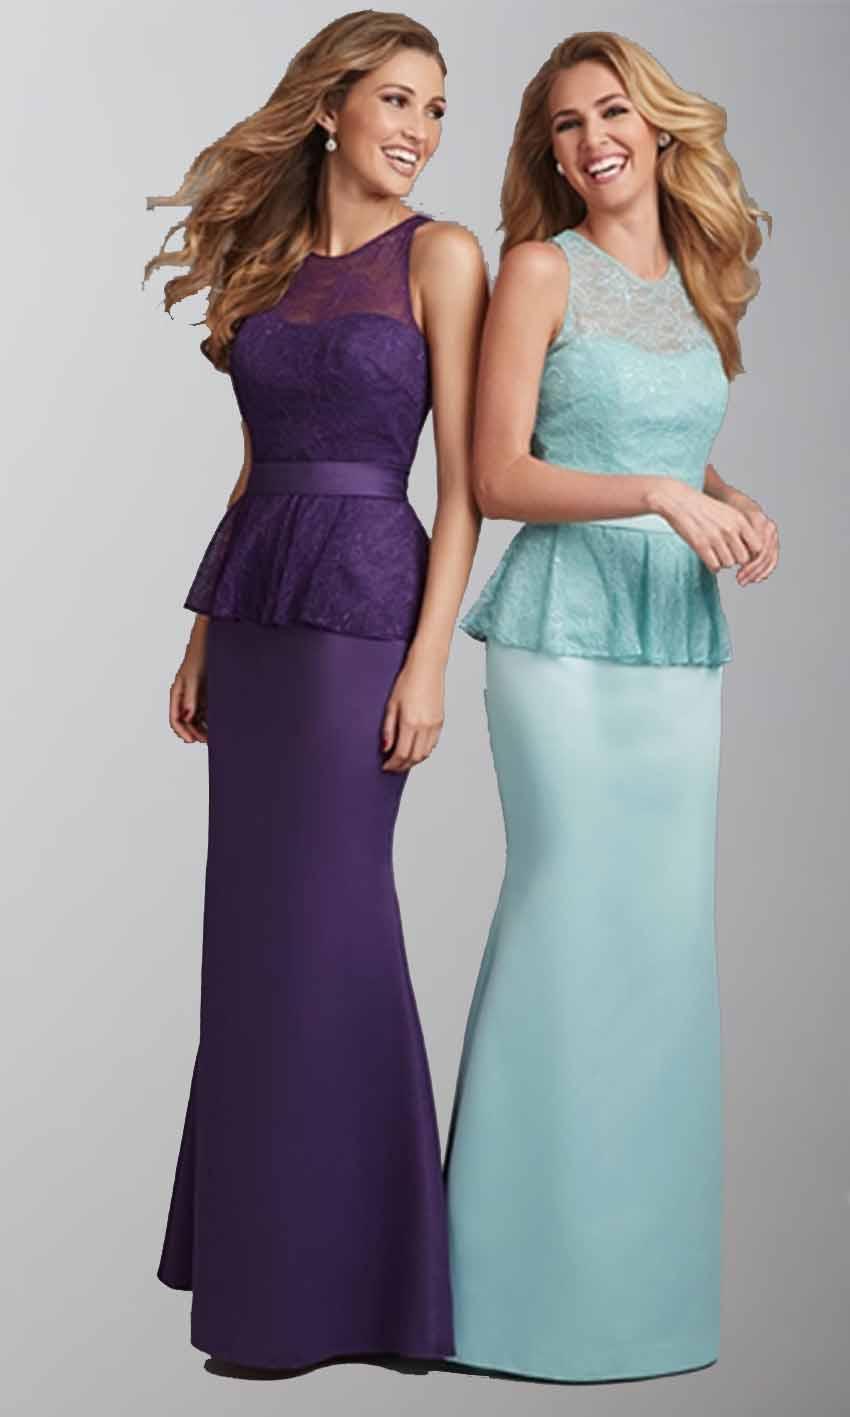 Elegant High Lace Illusion Long Sheath Bridesmaid Dresses KSP413 ...